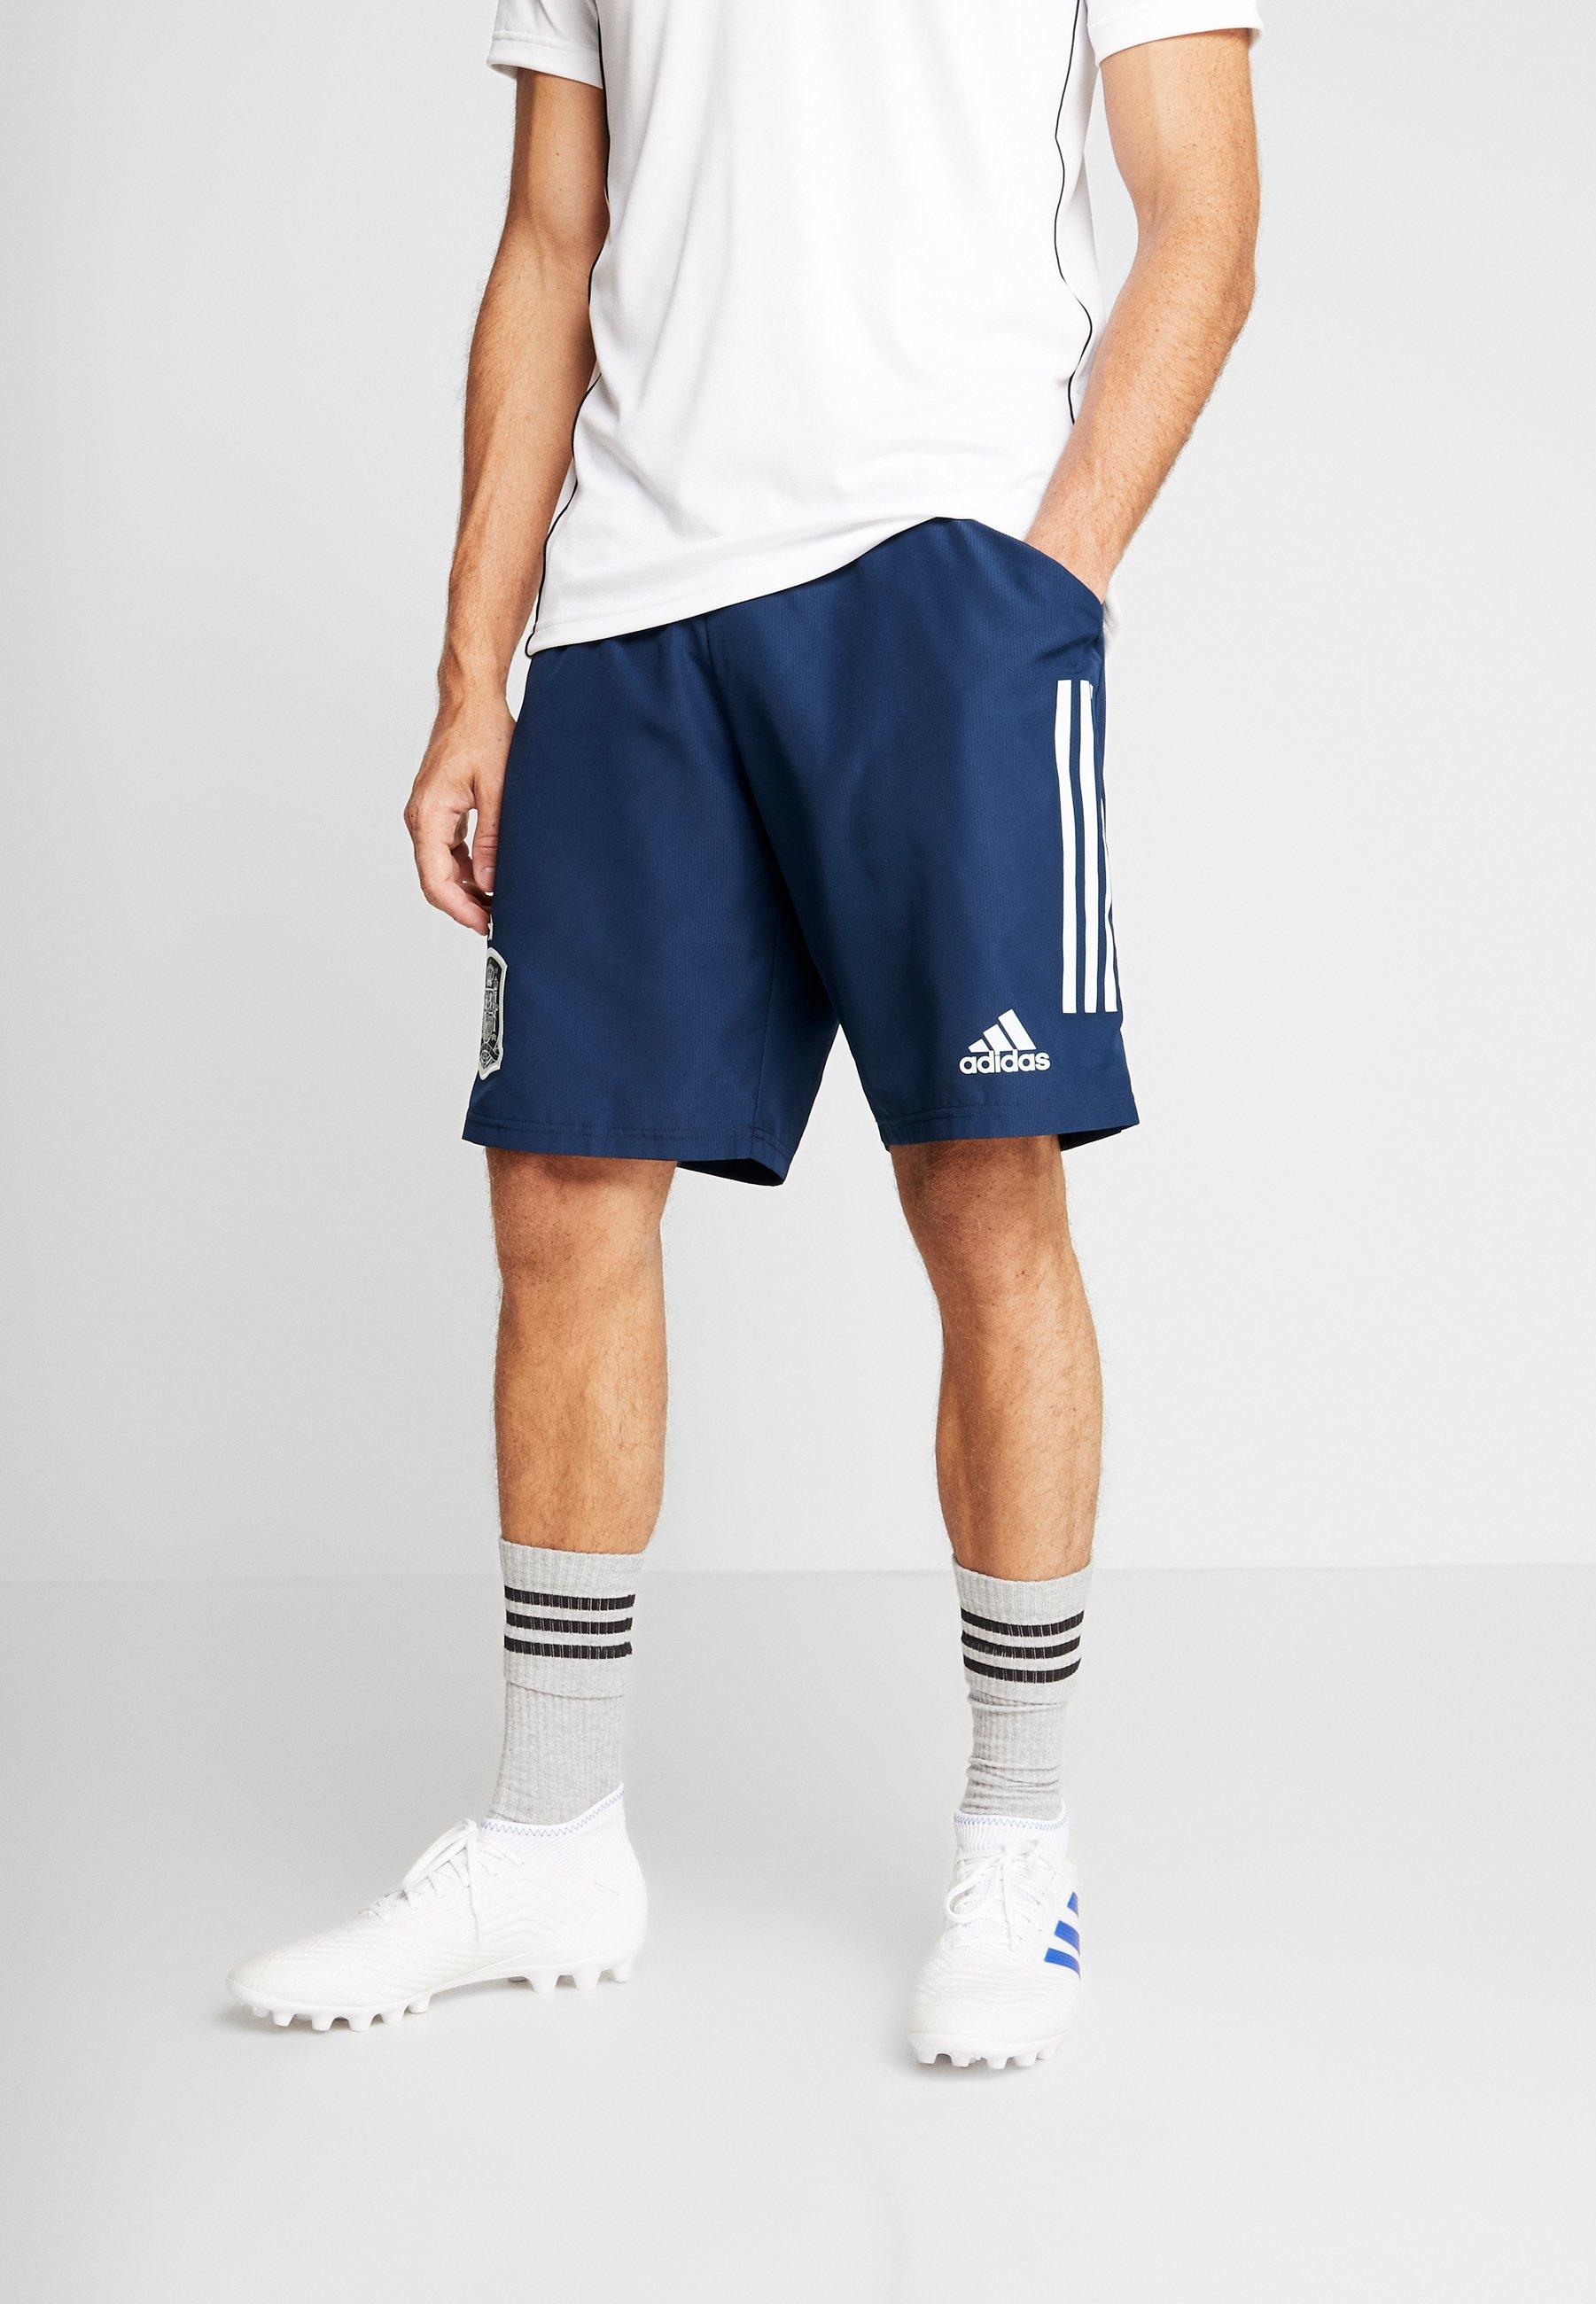 Homme SPAIN FEF SHORTS - Short de sport